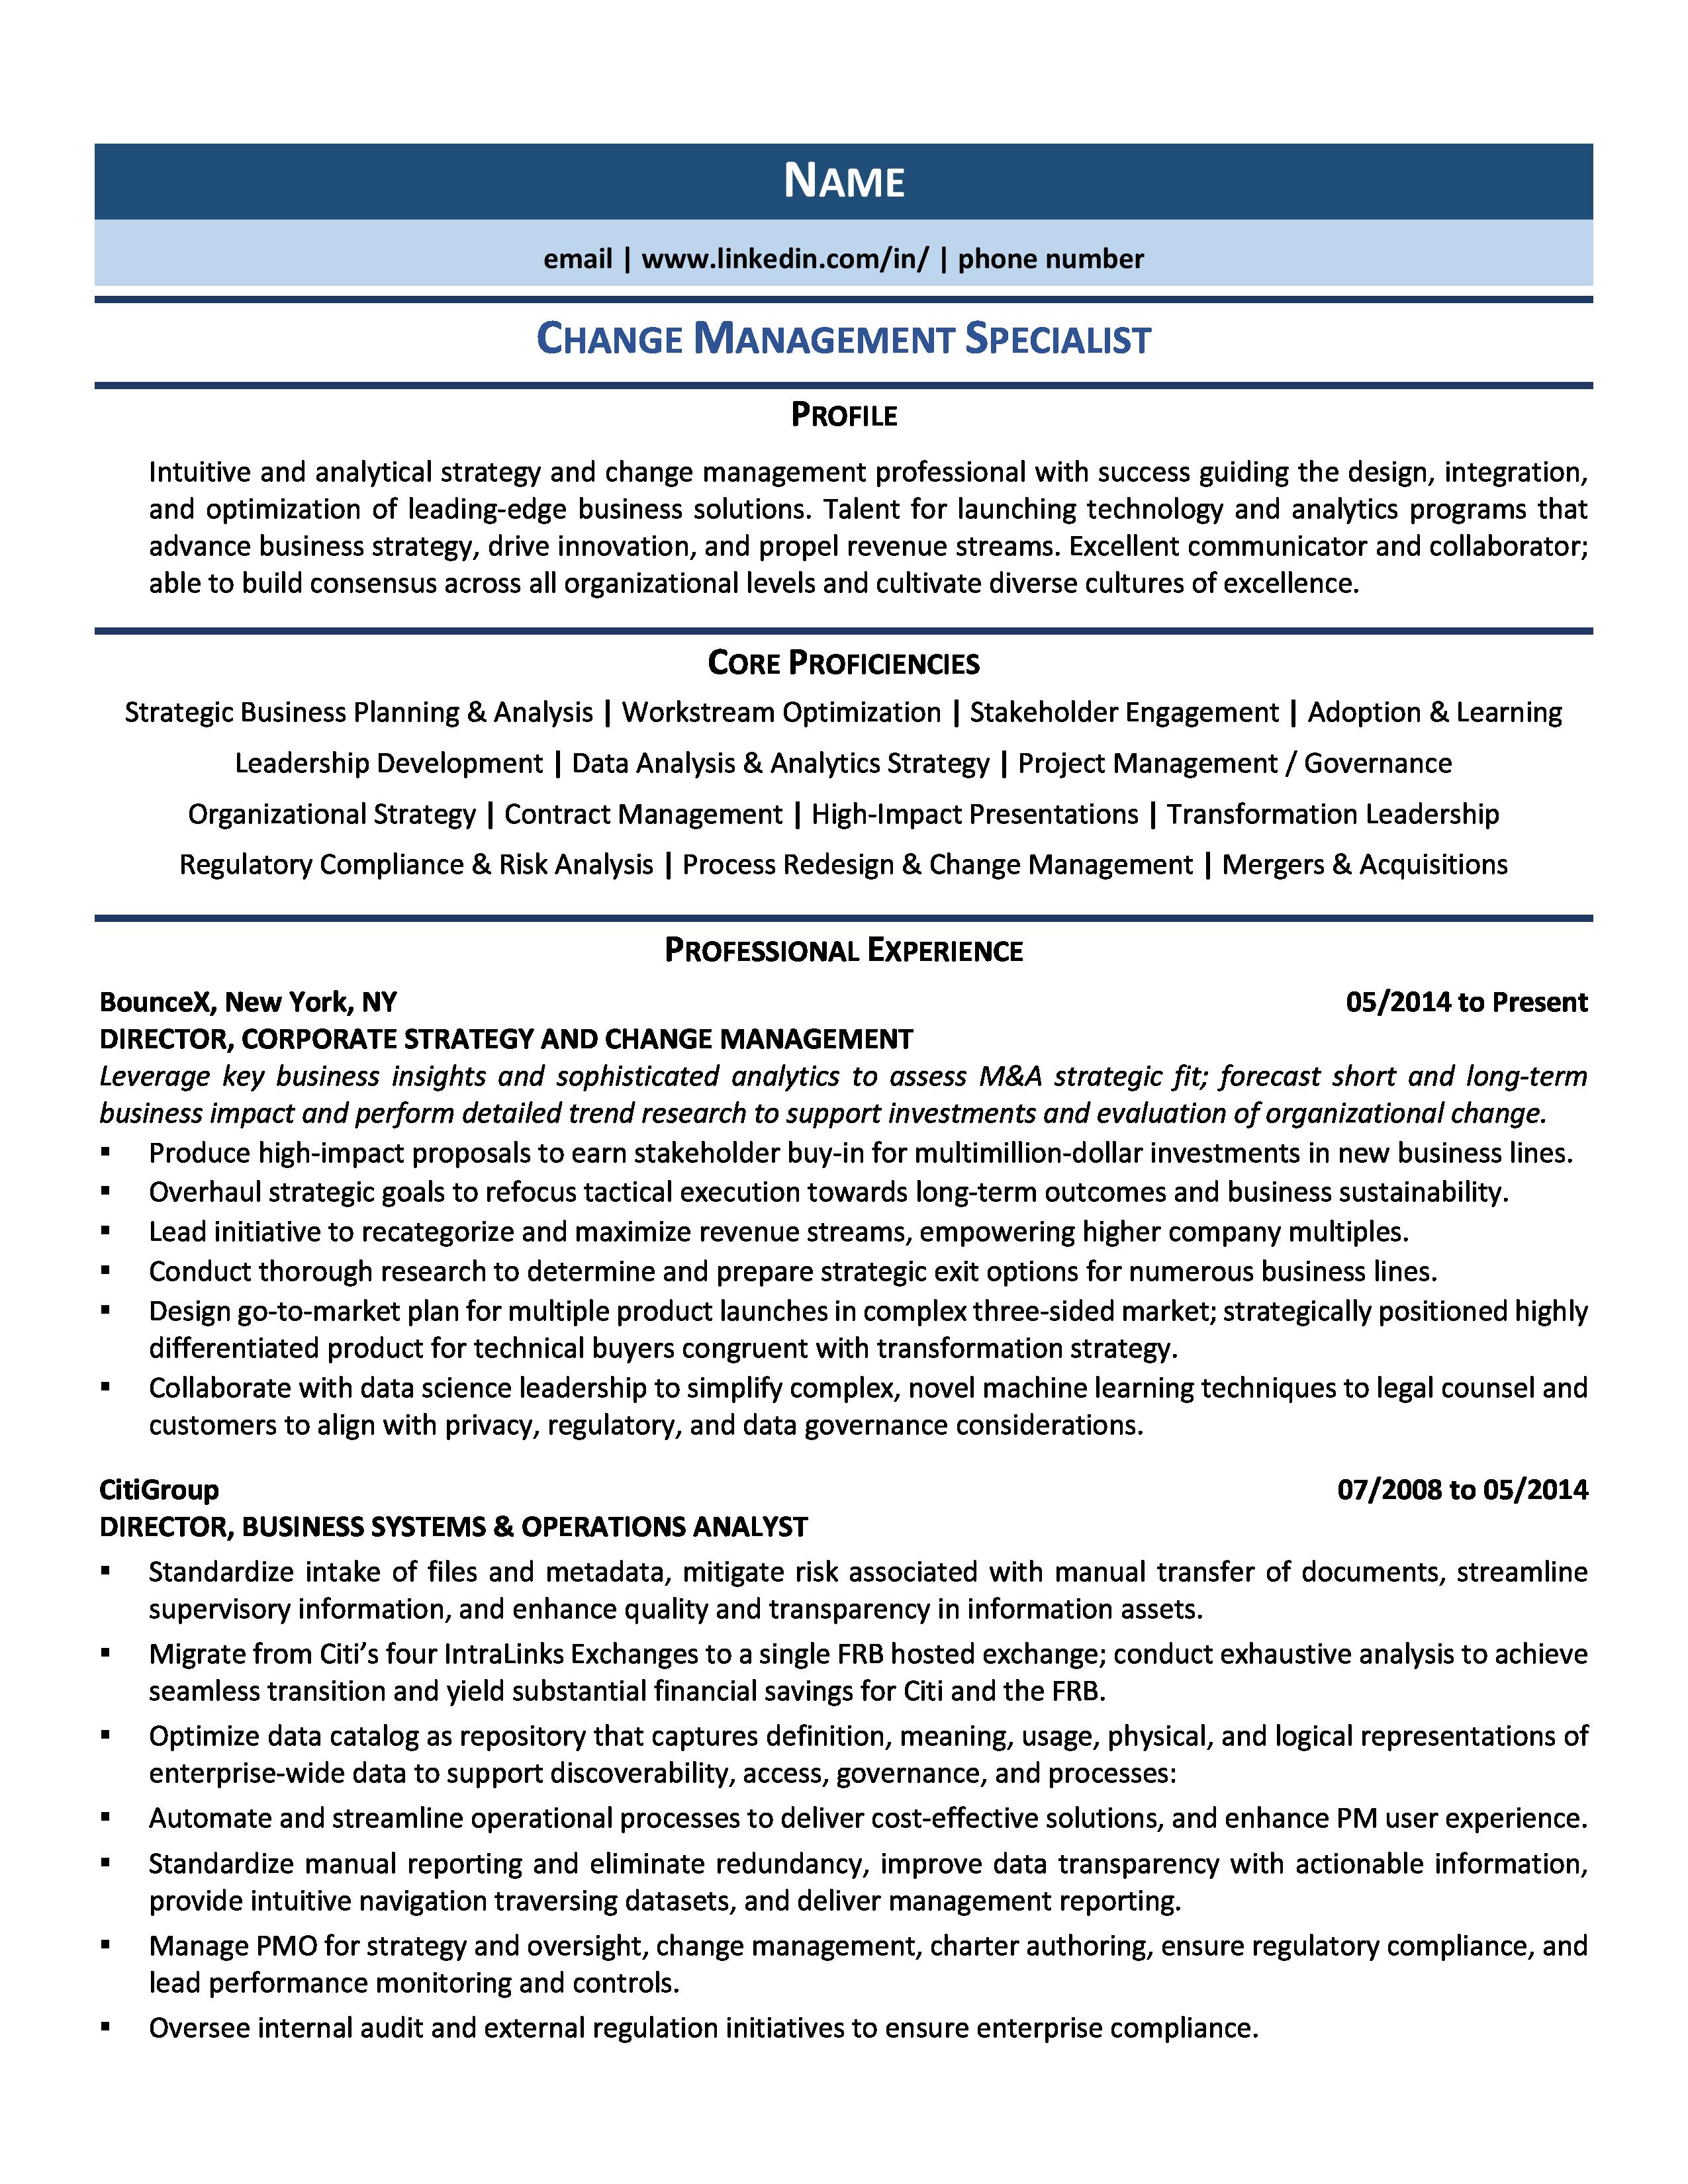 Change Management Specialist Resume Samples Template For 2020 Change Management Resume Examples Resume